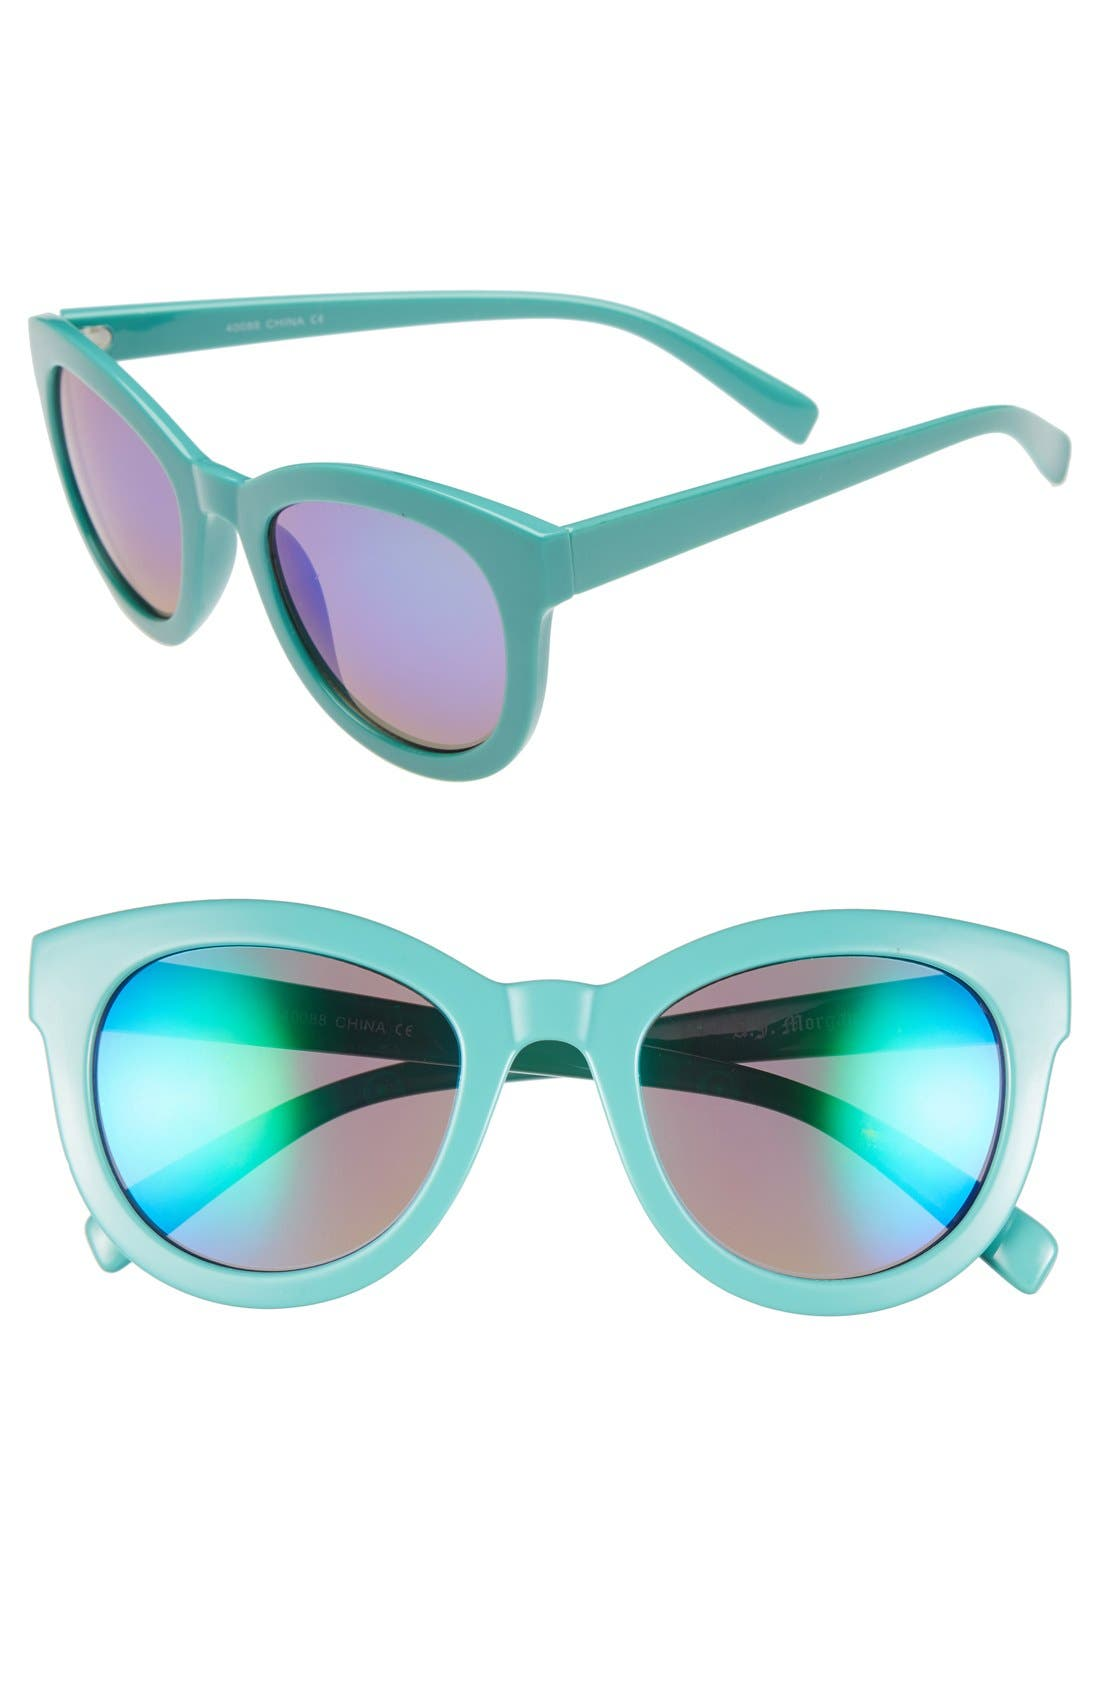 Alternate Image 1 Selected - A.J Morgan 'Hatch' 50mm Sunglasses